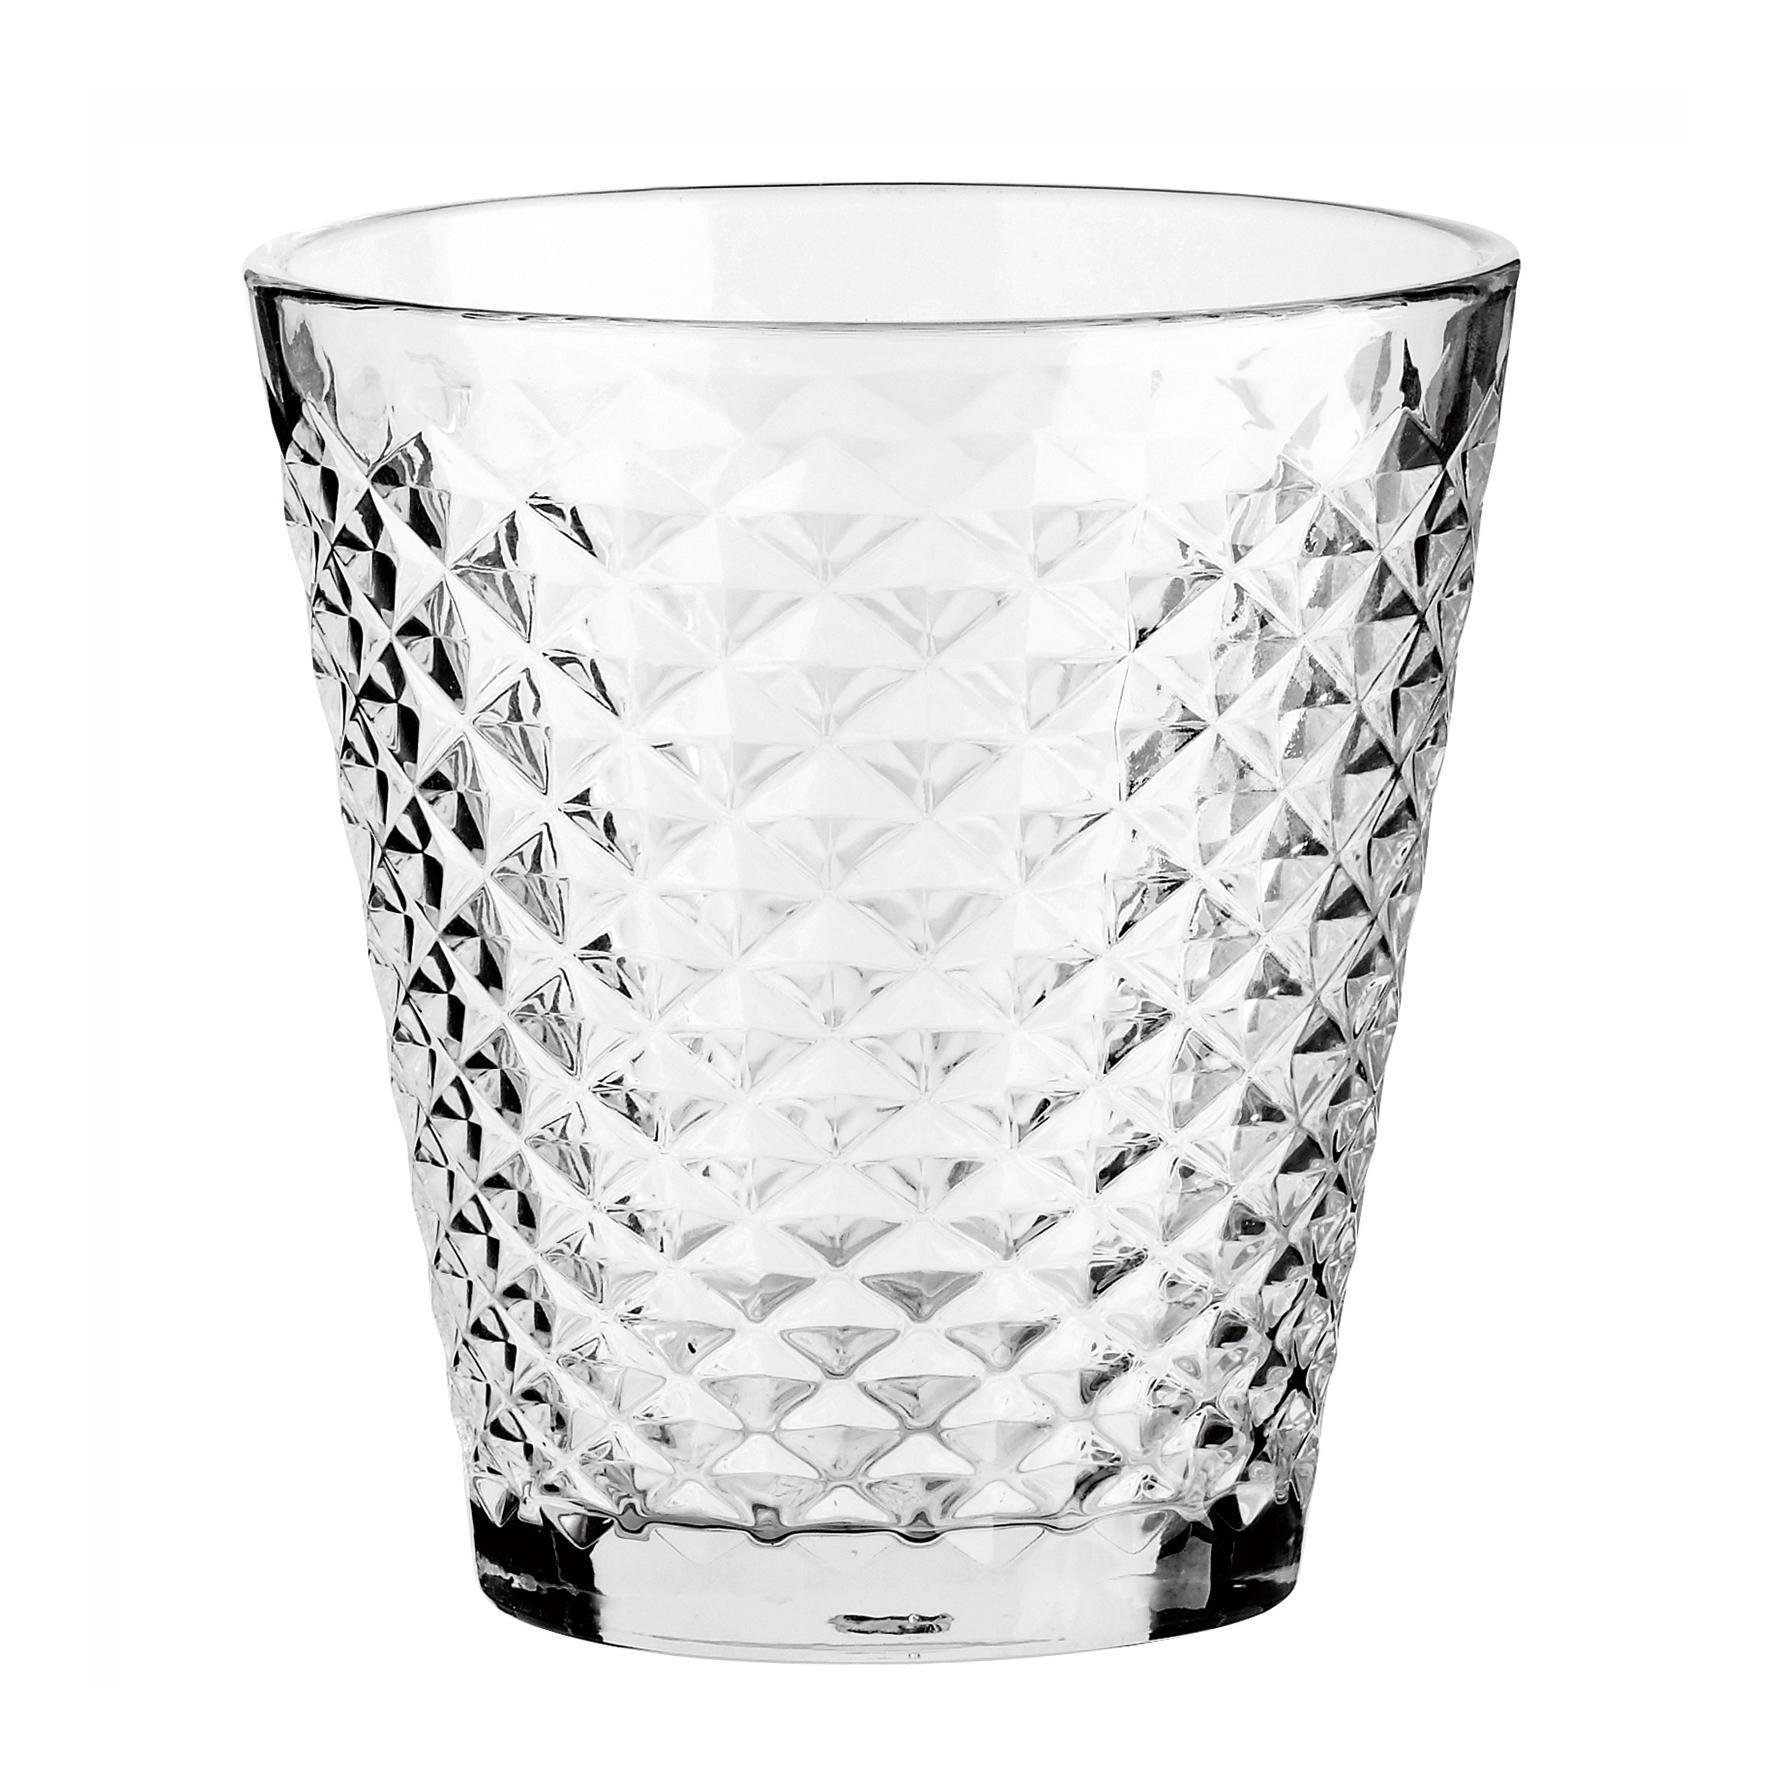 Tine K Home Váza Facet Clear, čirá barva, sklo